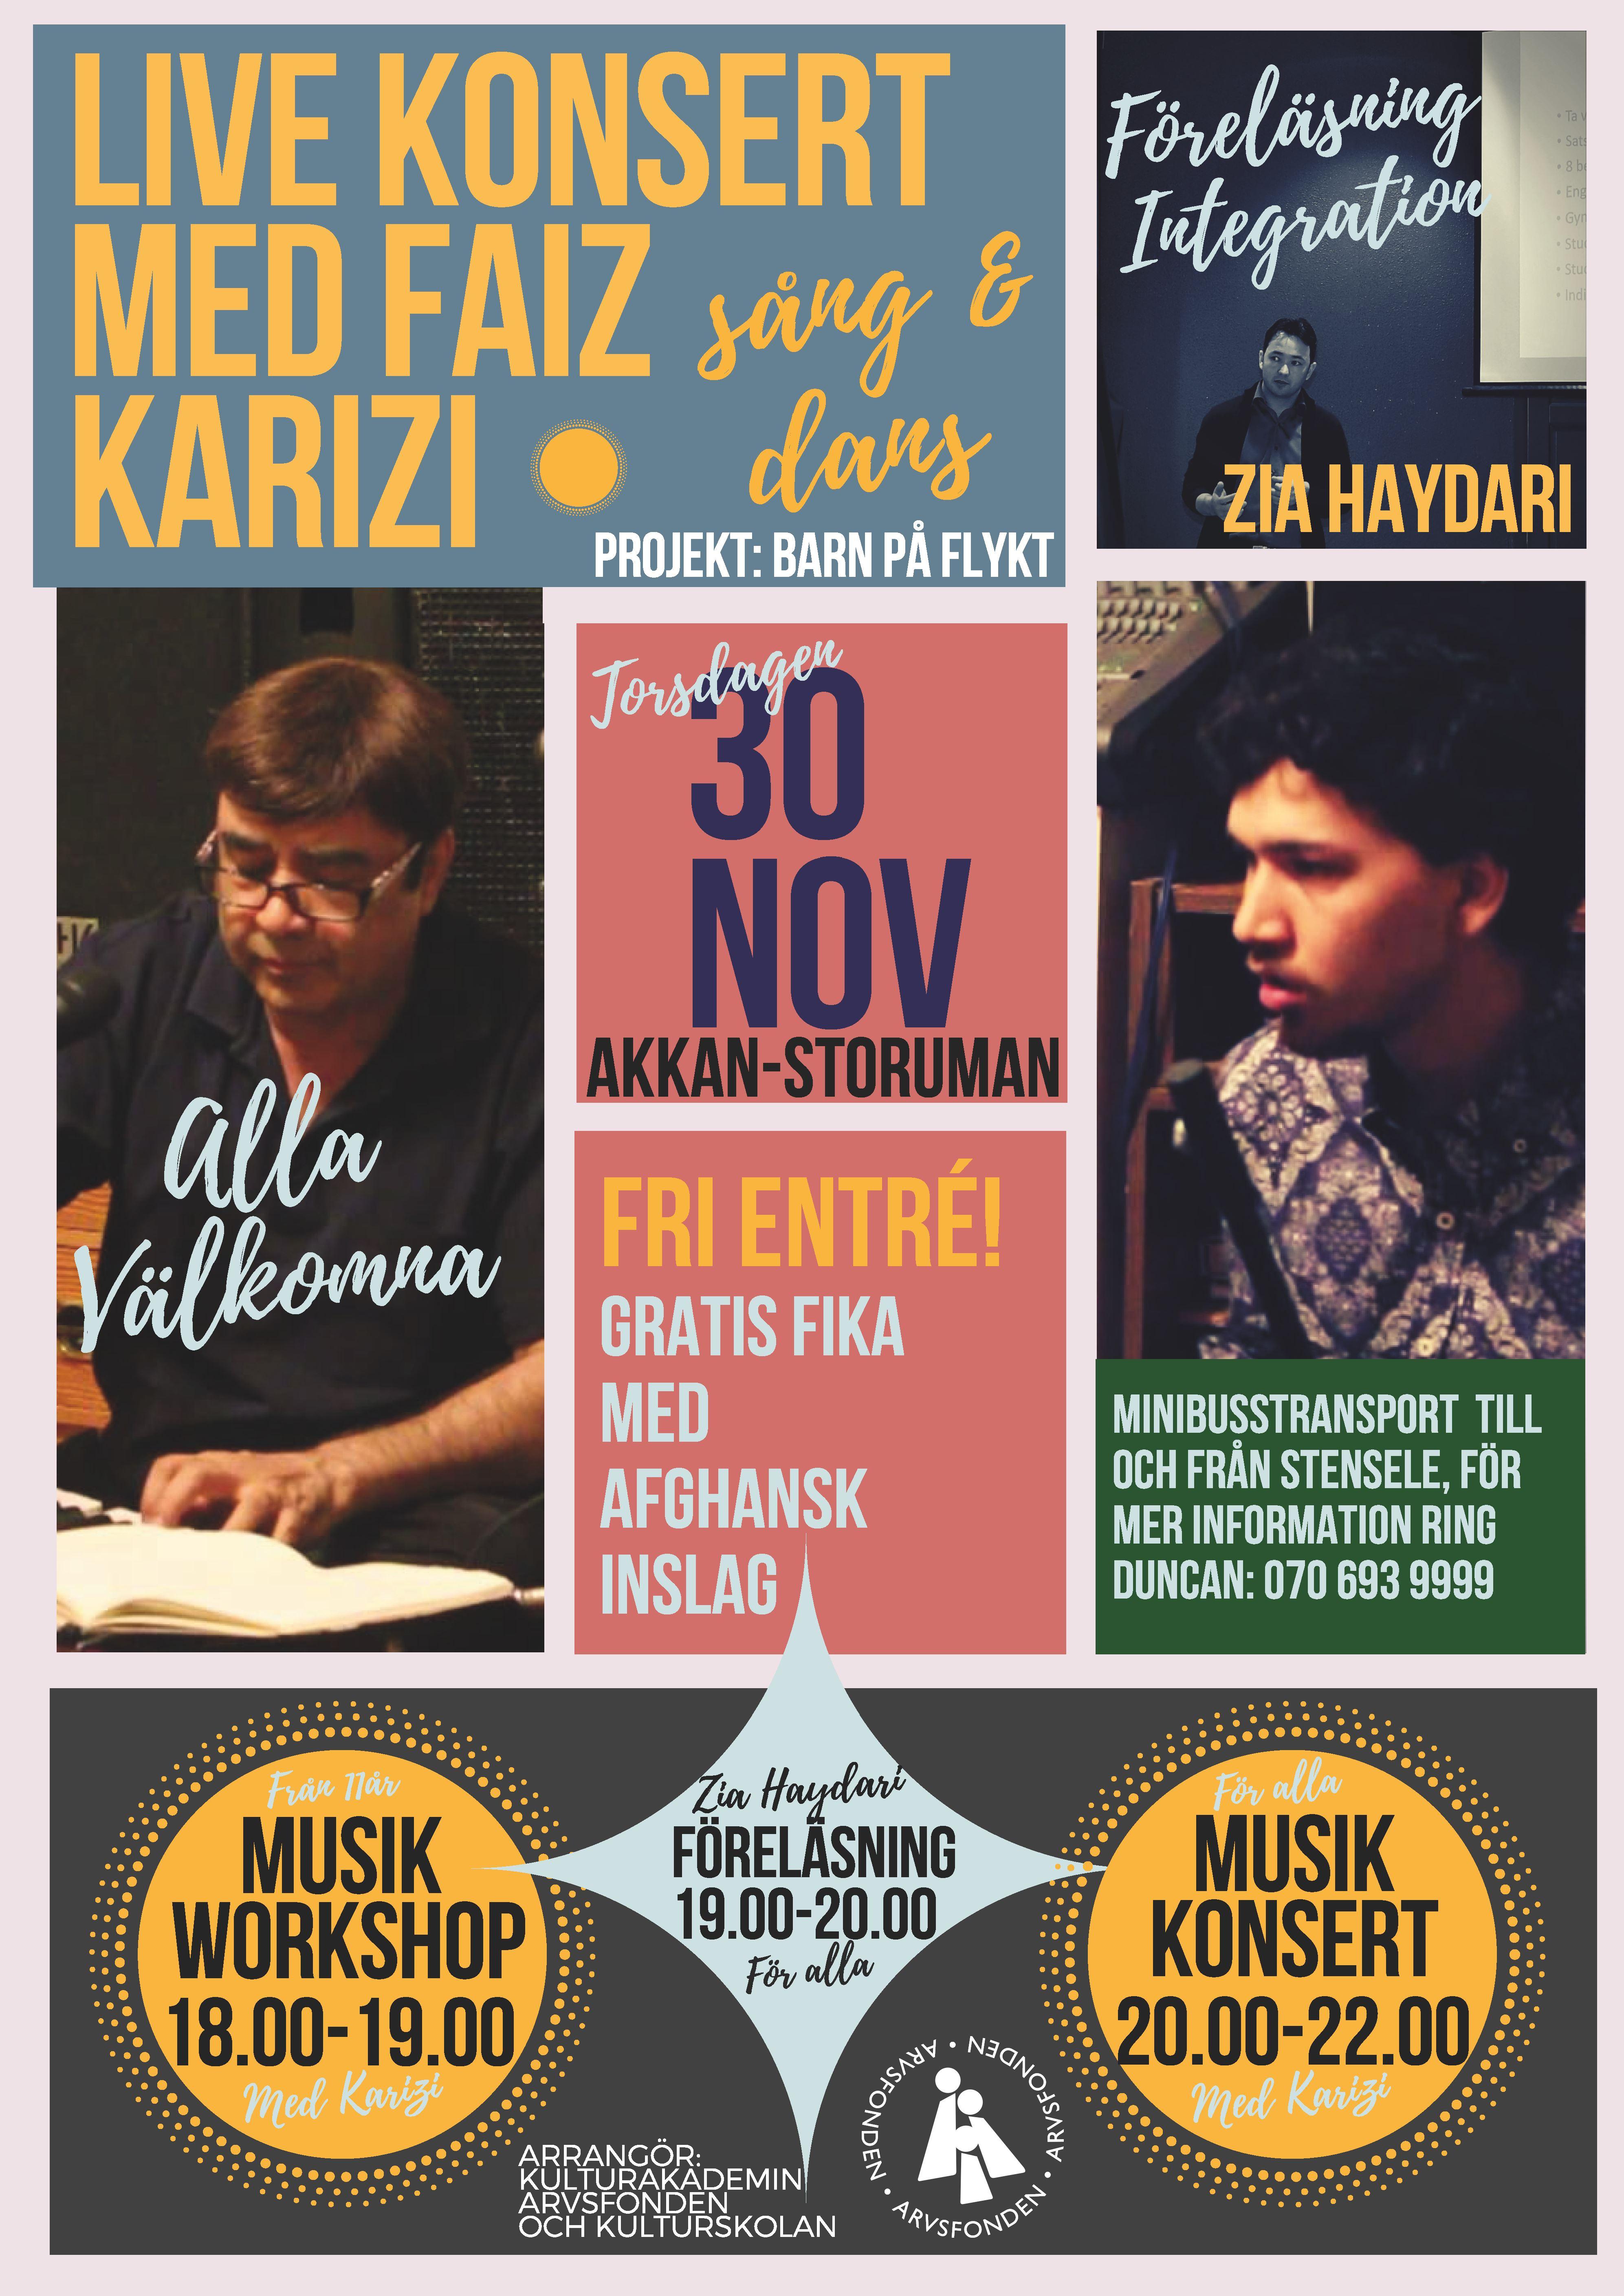 Livekonsert med Faiz Karizi